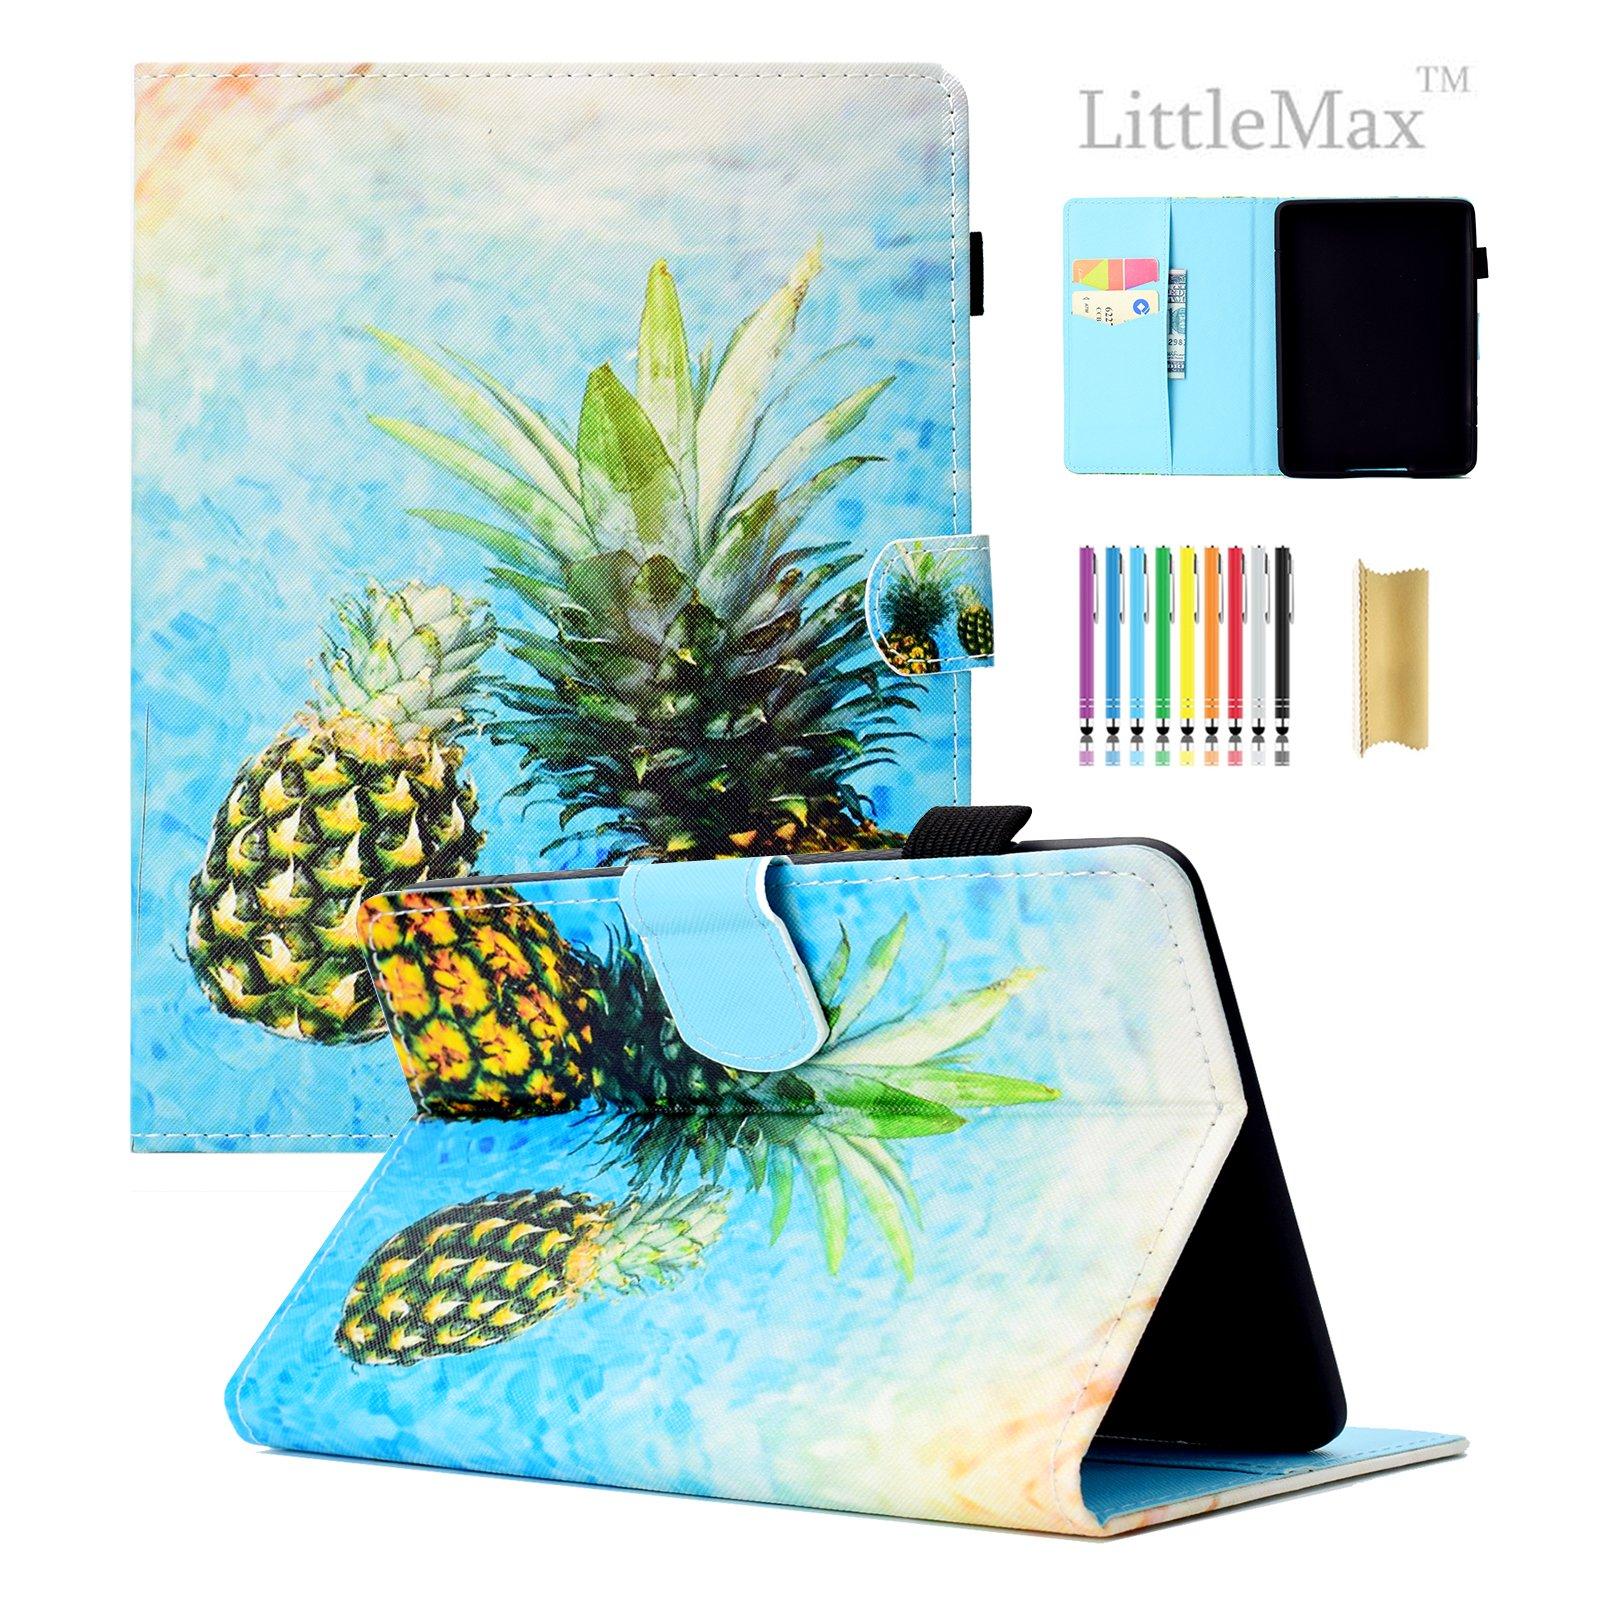 LittleMax Case for Amazon Kindle Paperwhite 1/2/3/4,Colorful PU Leather Kickstand Auto Wake/Sleep Cover for All Amazon Kindle Paperwhite (2012/2013/2015/2016 version)-#2 Two Pineapple